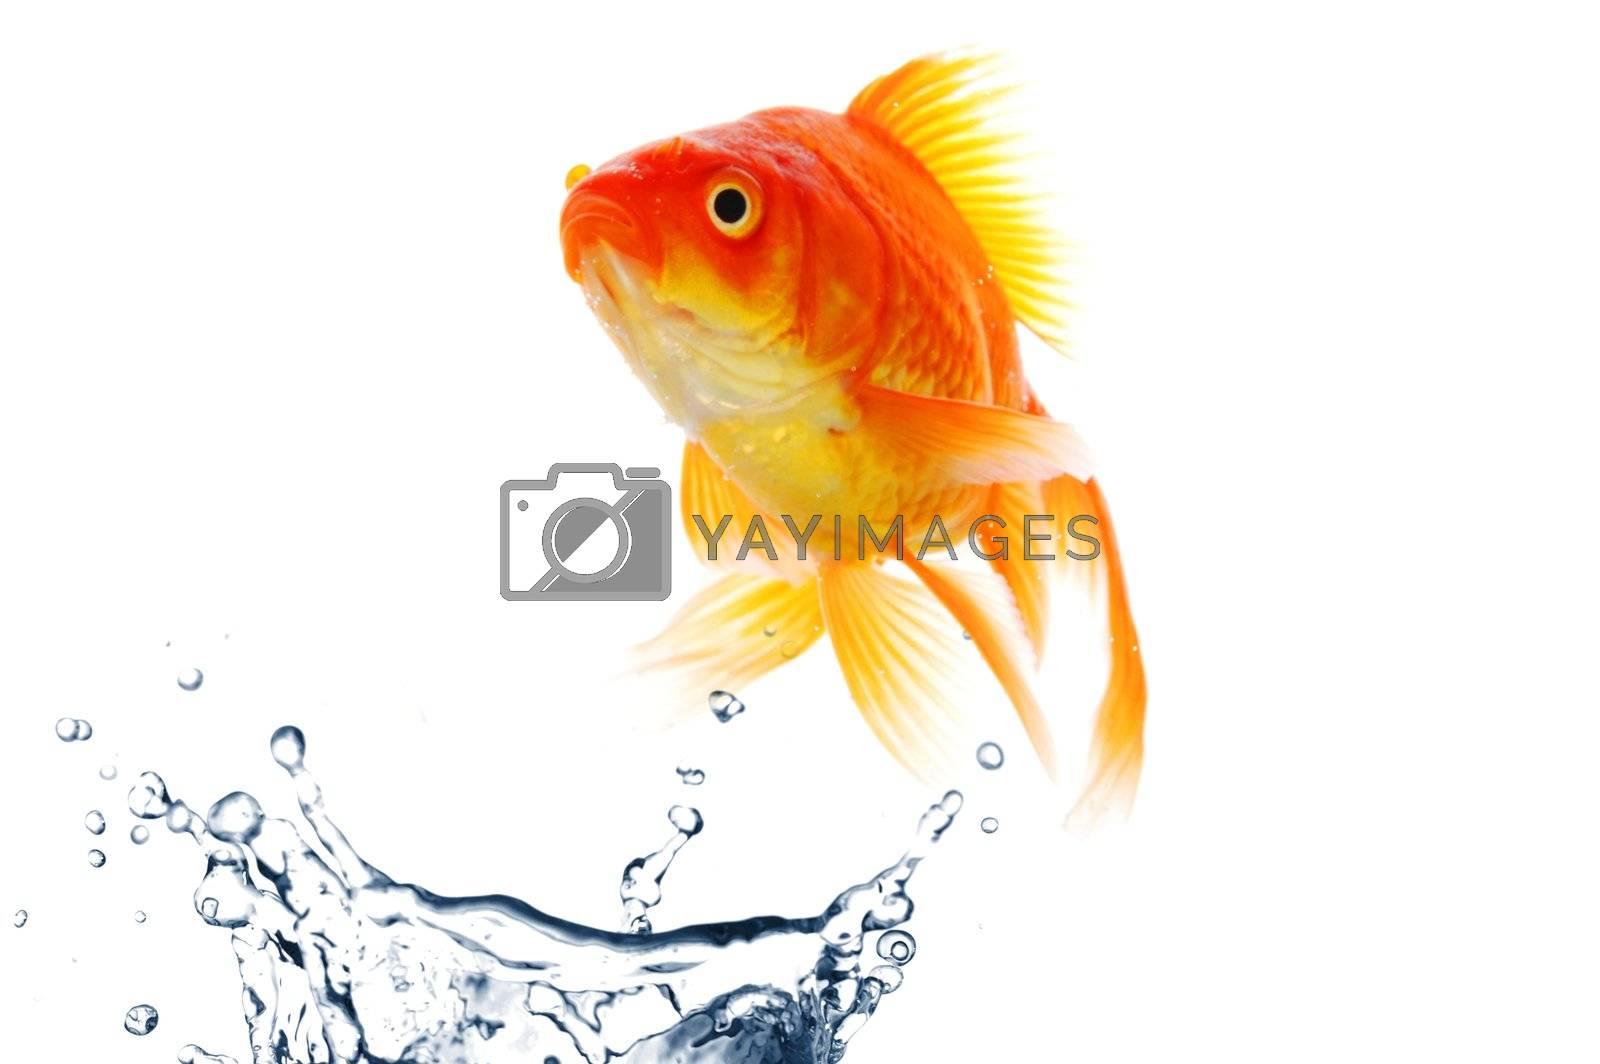 Royalty free image of goldfish by gunnar3000